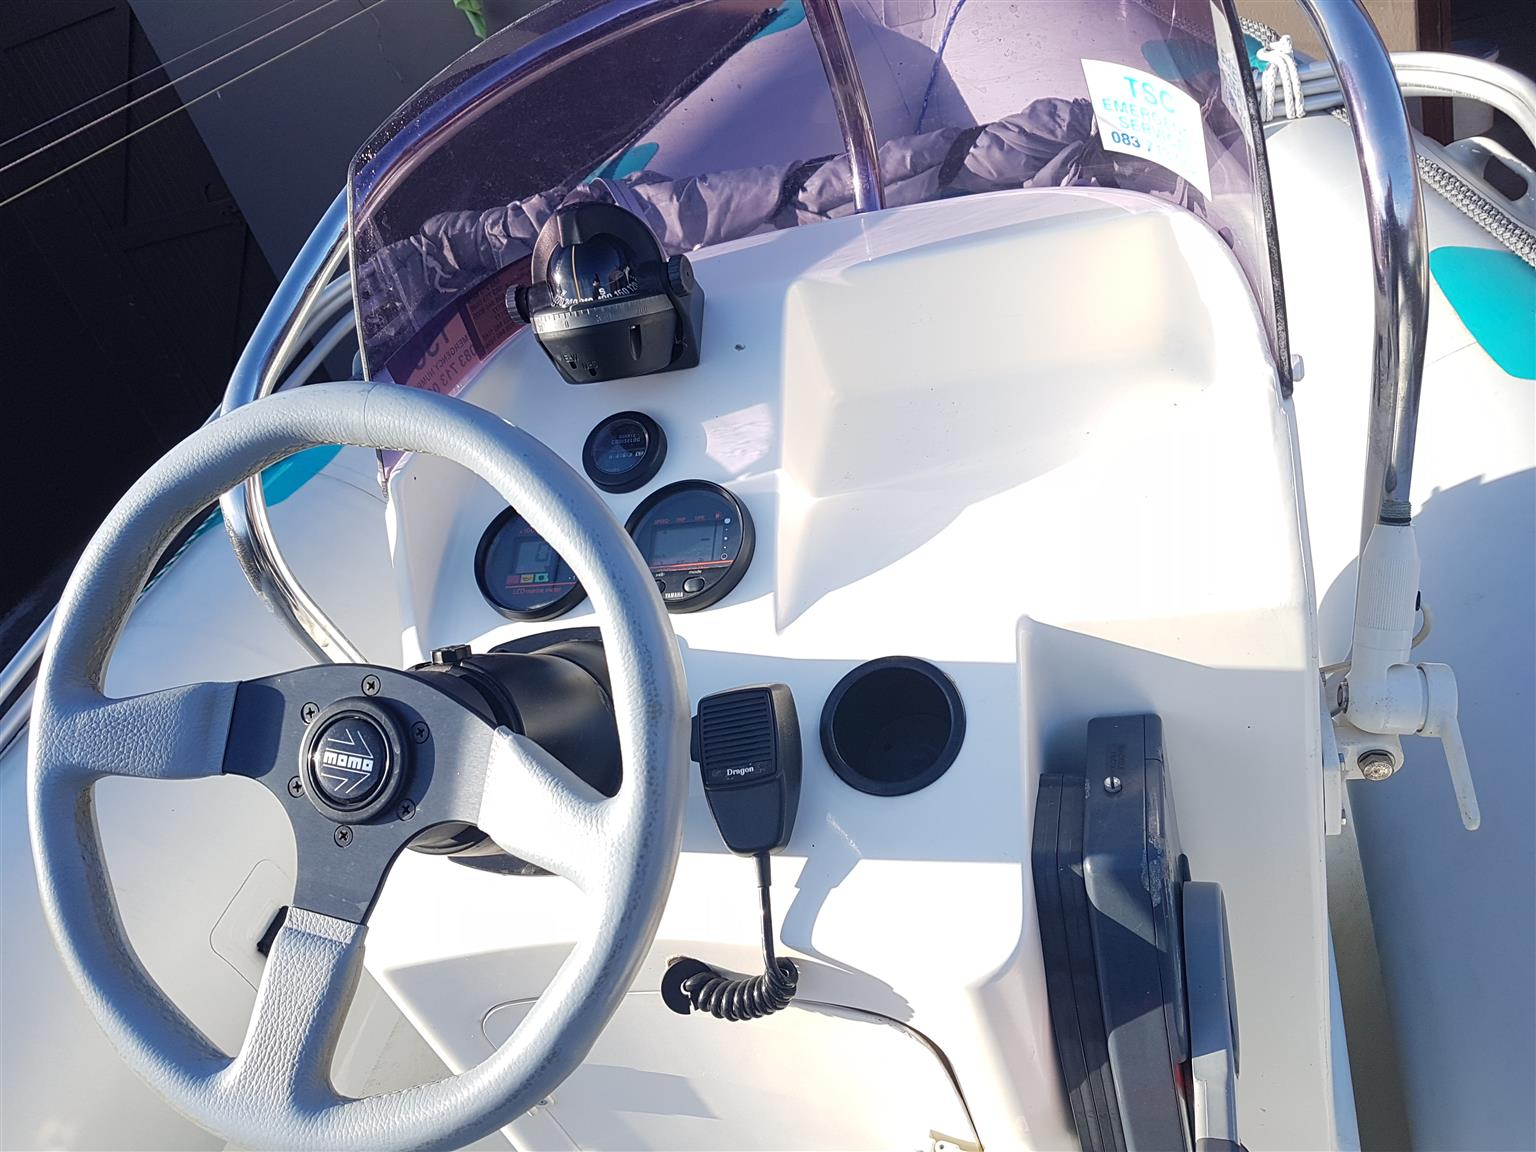 Gemini Wave rider 550 with Yamaha V4 130hp trim and tilt